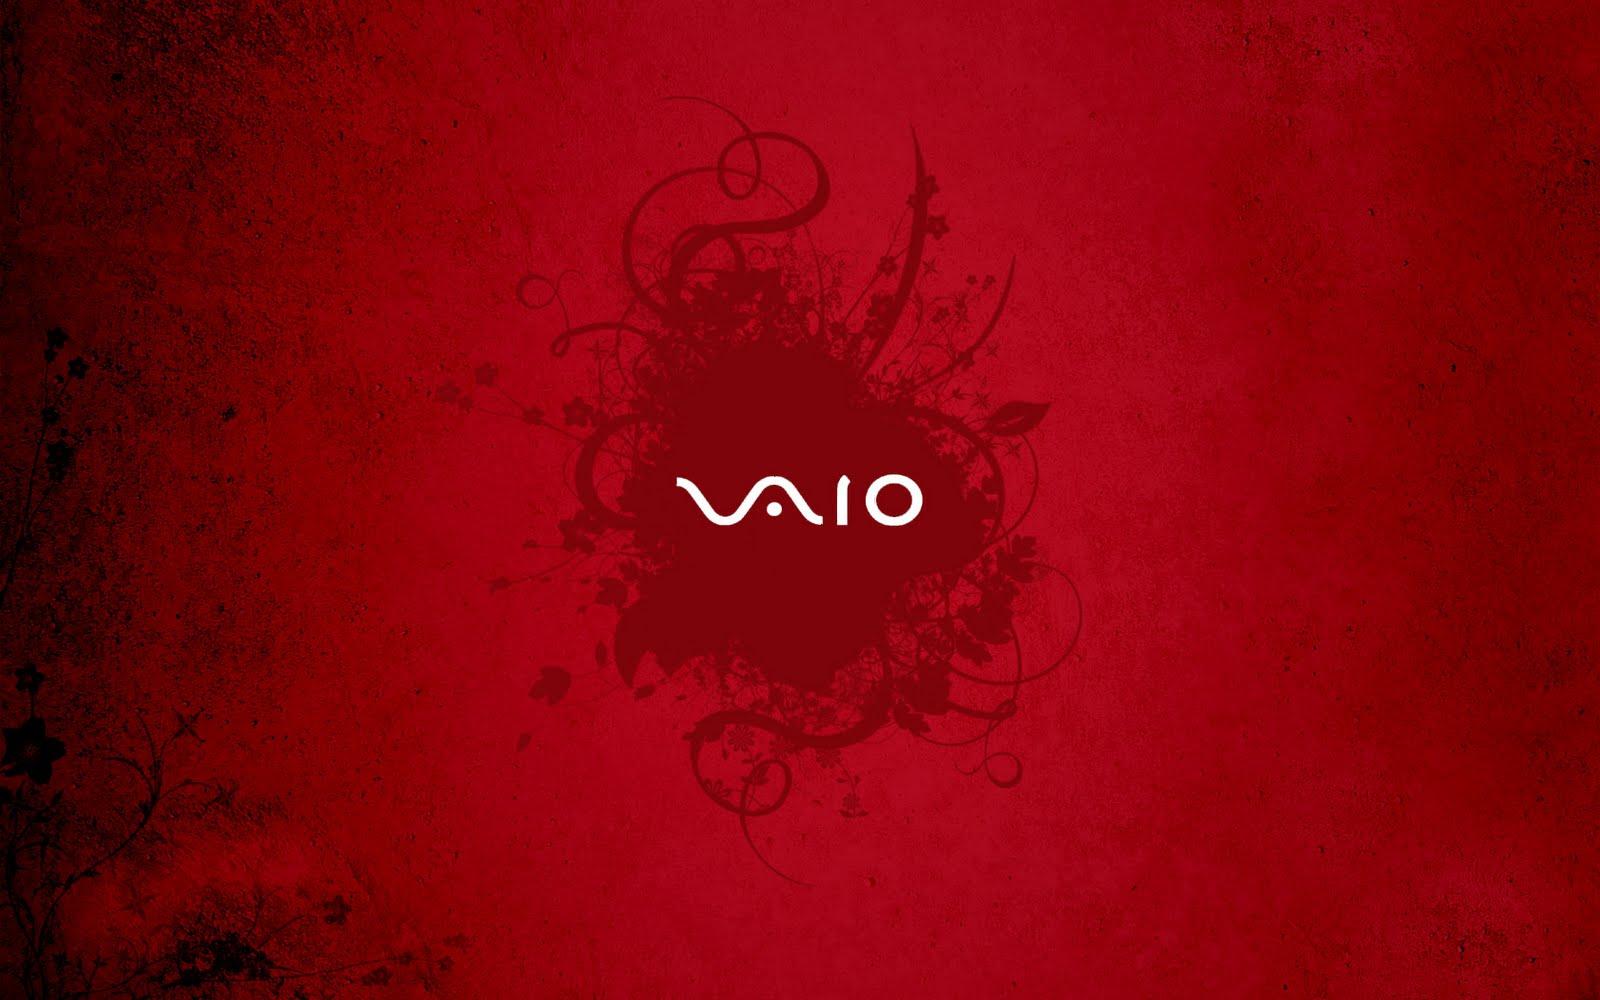 http://3.bp.blogspot.com/-QHGbpMZUsCg/TkkKBOvqOmI/AAAAAAAAAVo/HcipP1jtRds/s1600/Sony-Vaio-Wallpaper-1.jpg